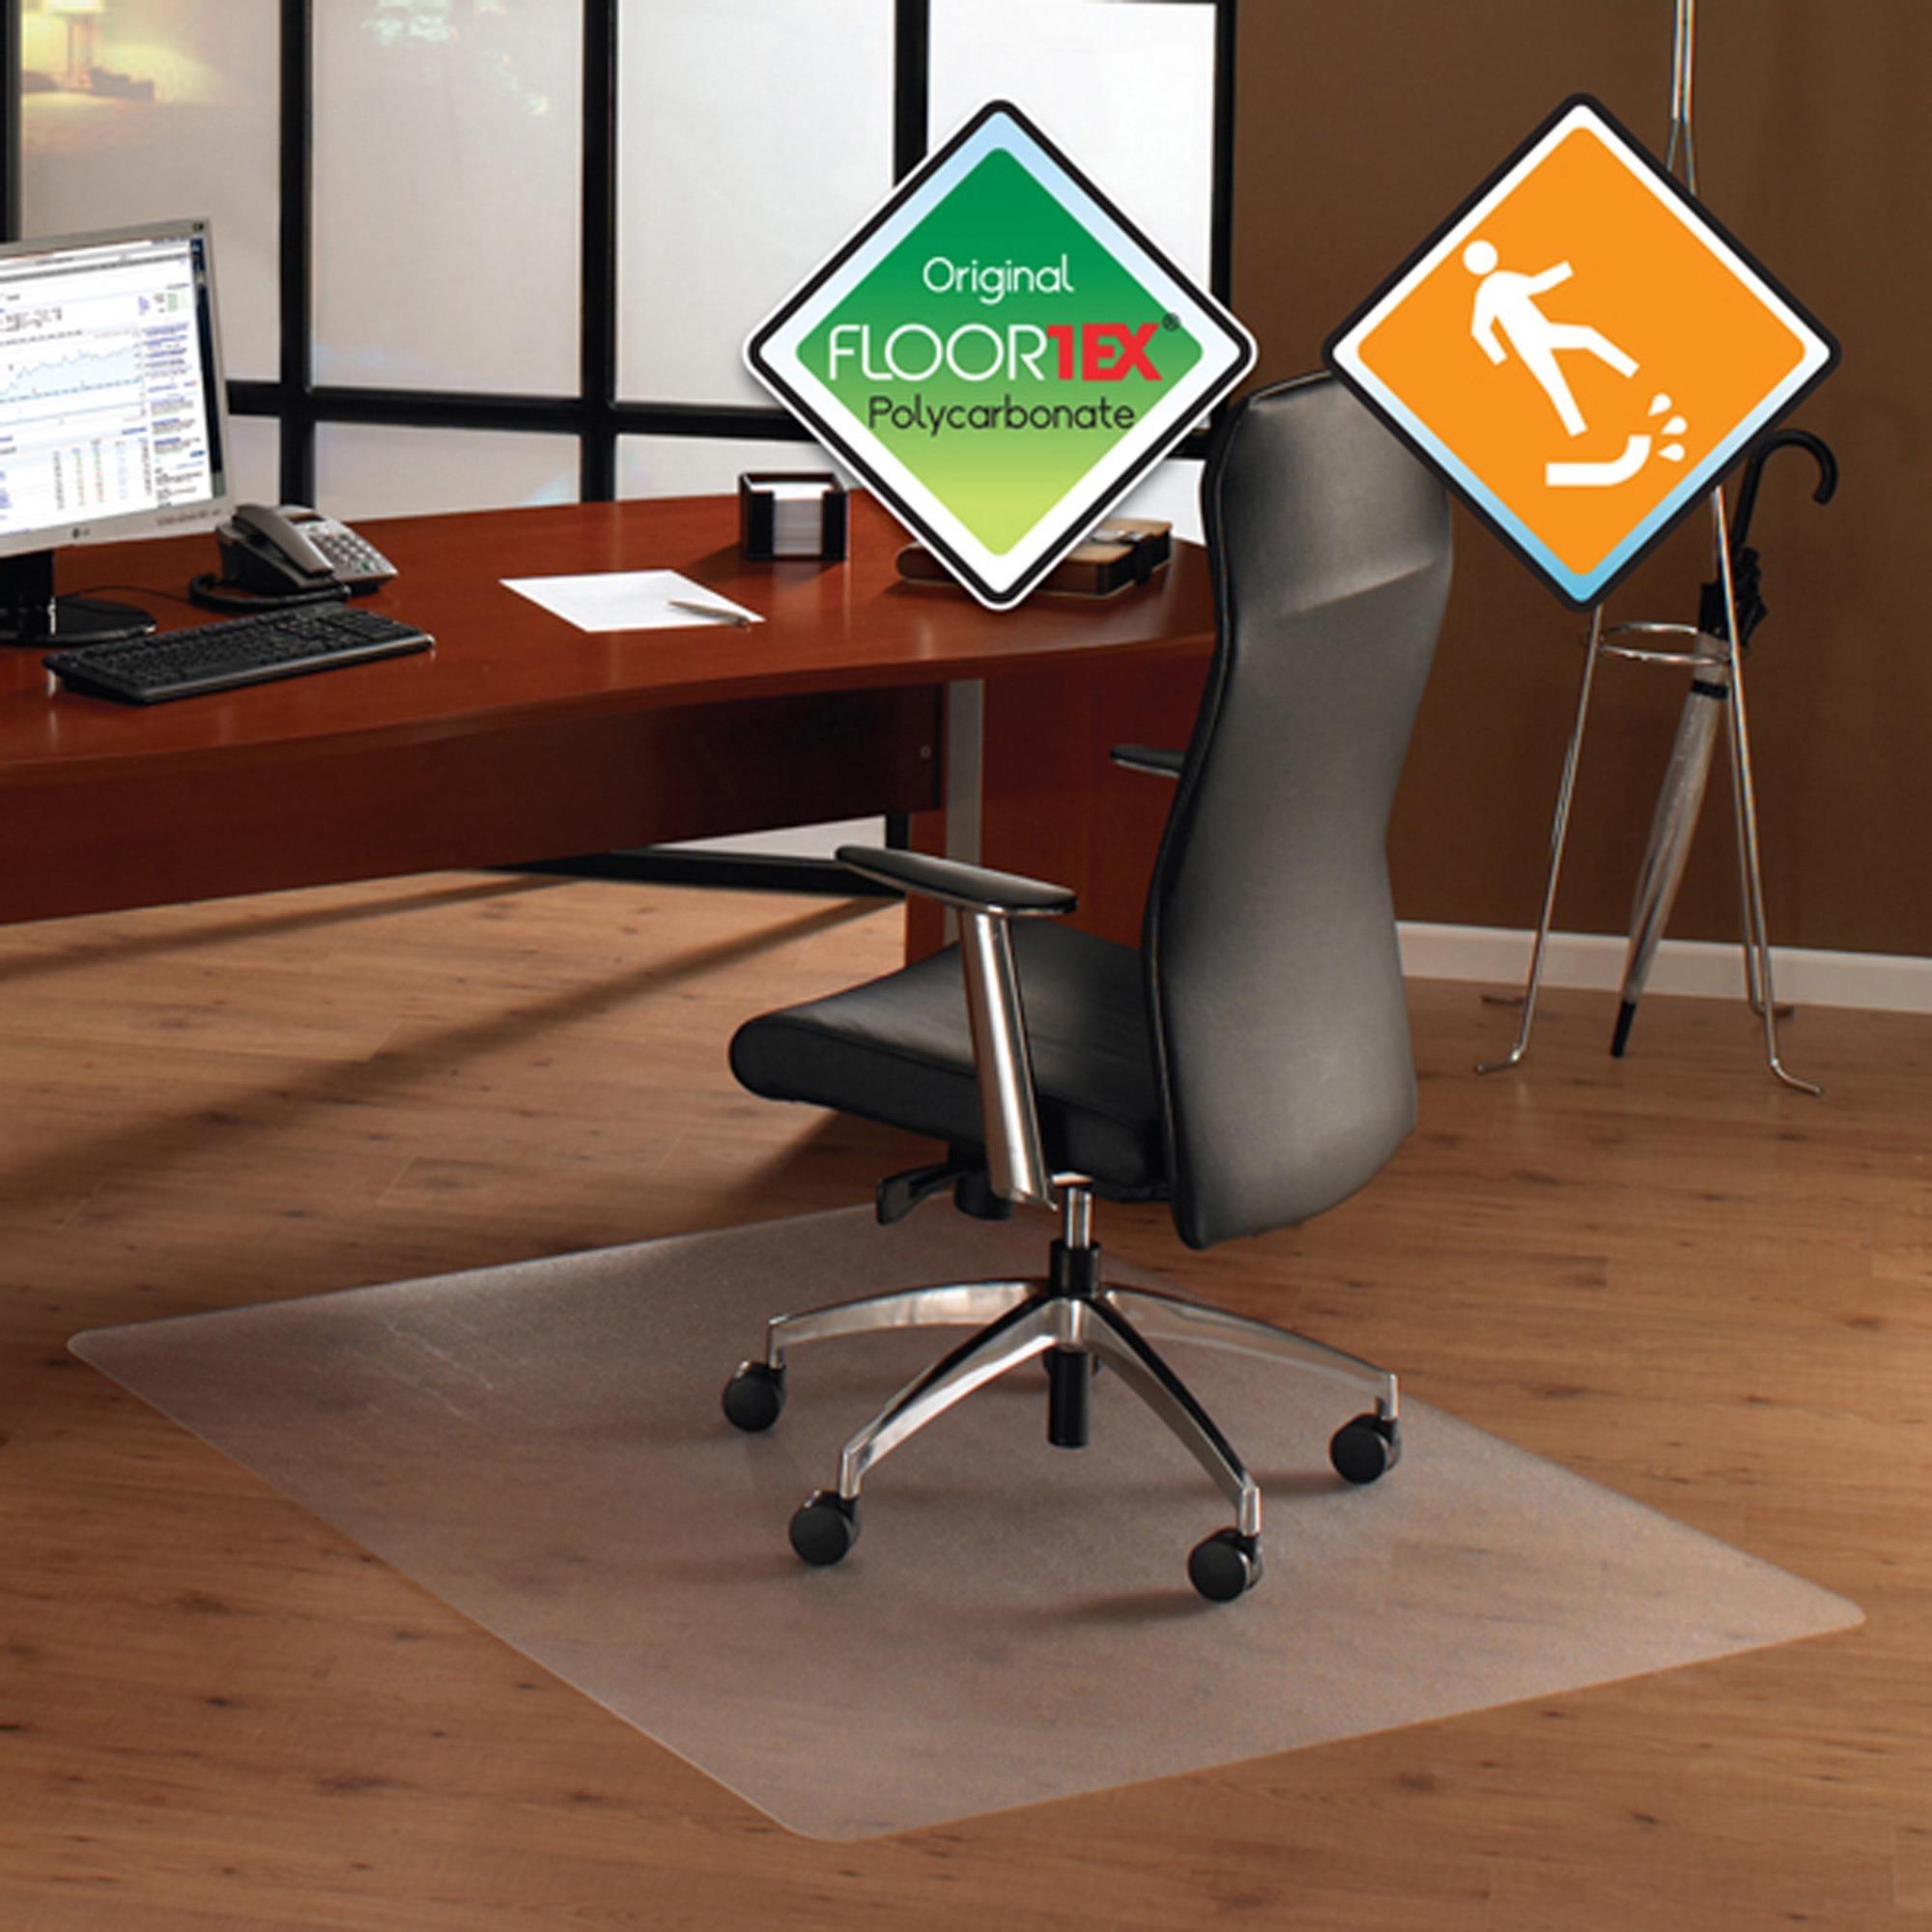 Floortex Cleartex Ultimat 35 x 47 Chair Mat for Hard Floor, Rectangular